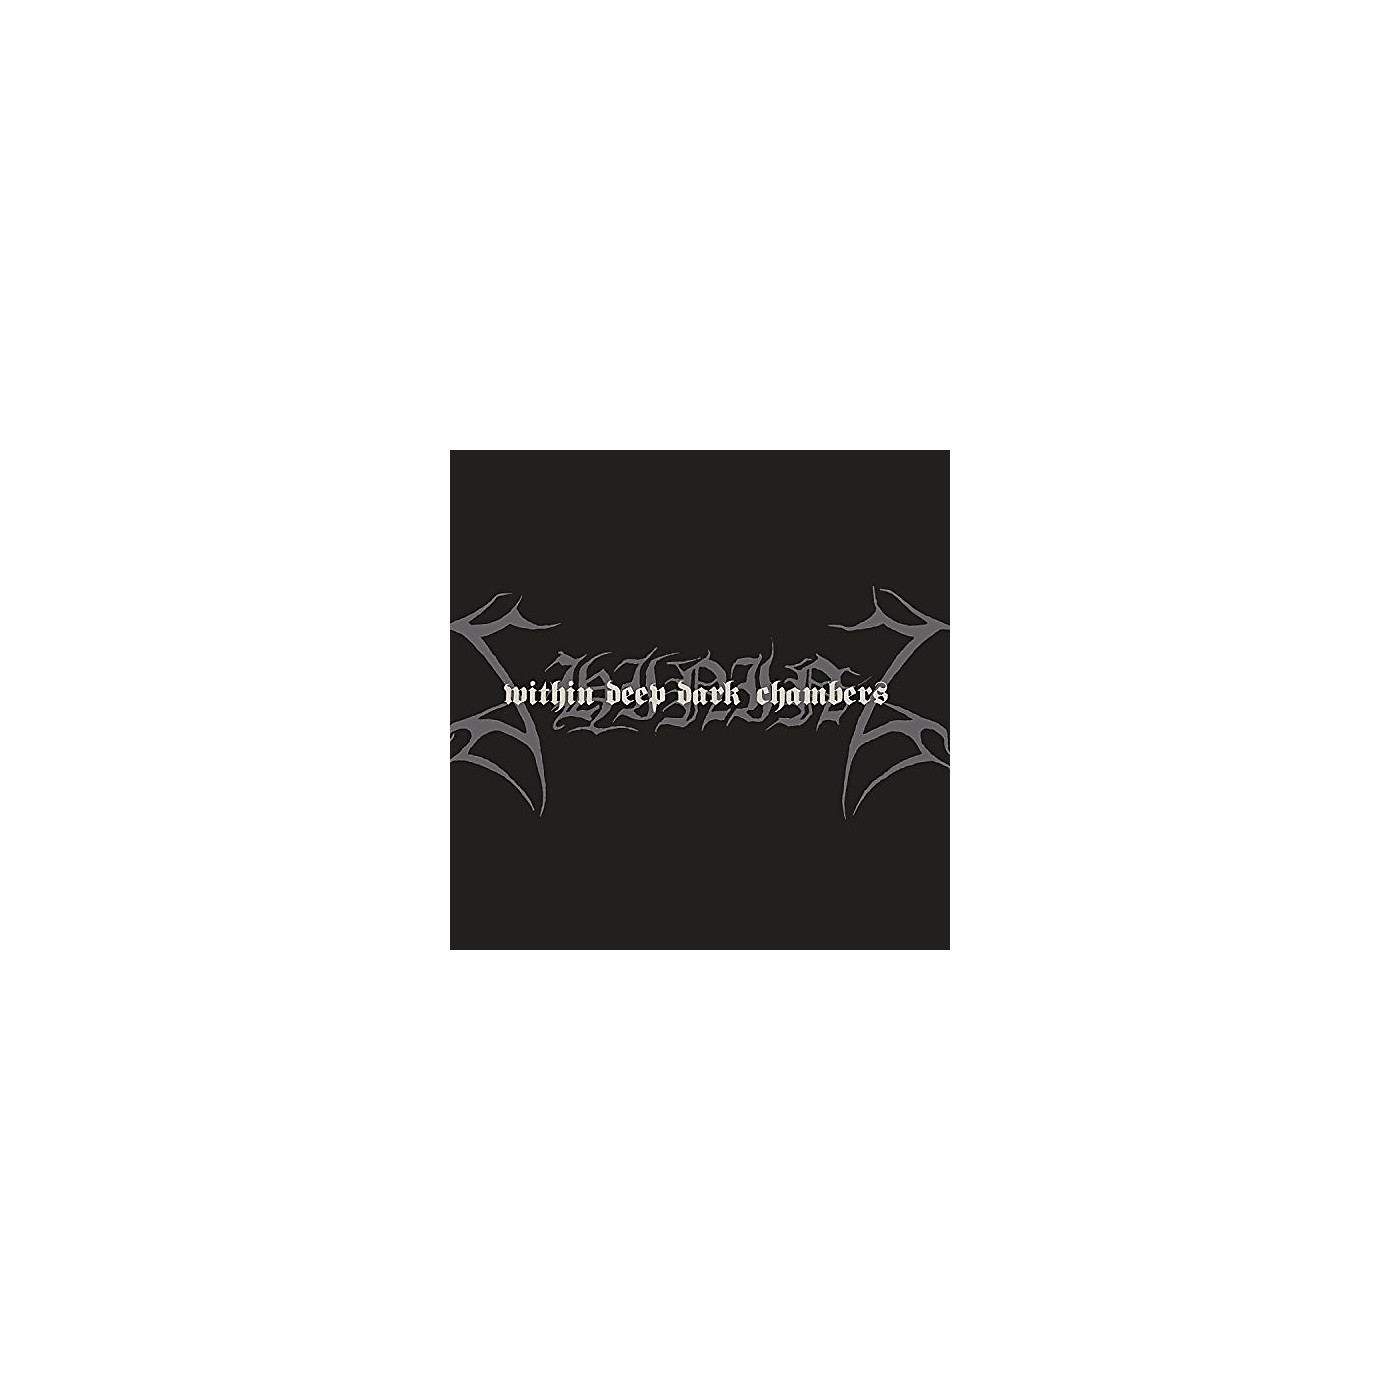 Alliance The Shining - I - Within Deep Dark Chambers thumbnail